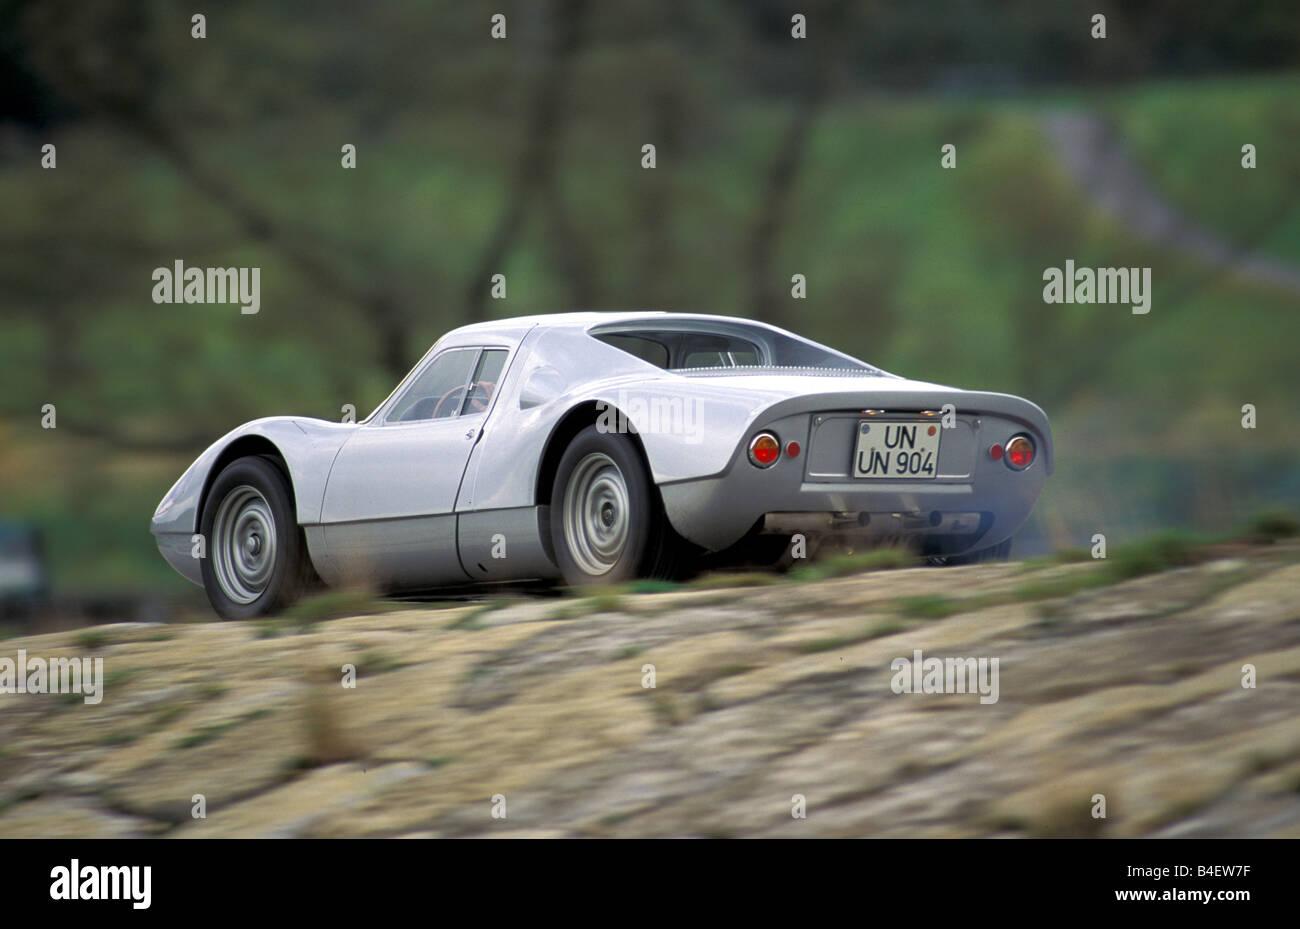 Car Porsche 904 Carrera Gts Vintage Car Sports Car Coupe Coupe